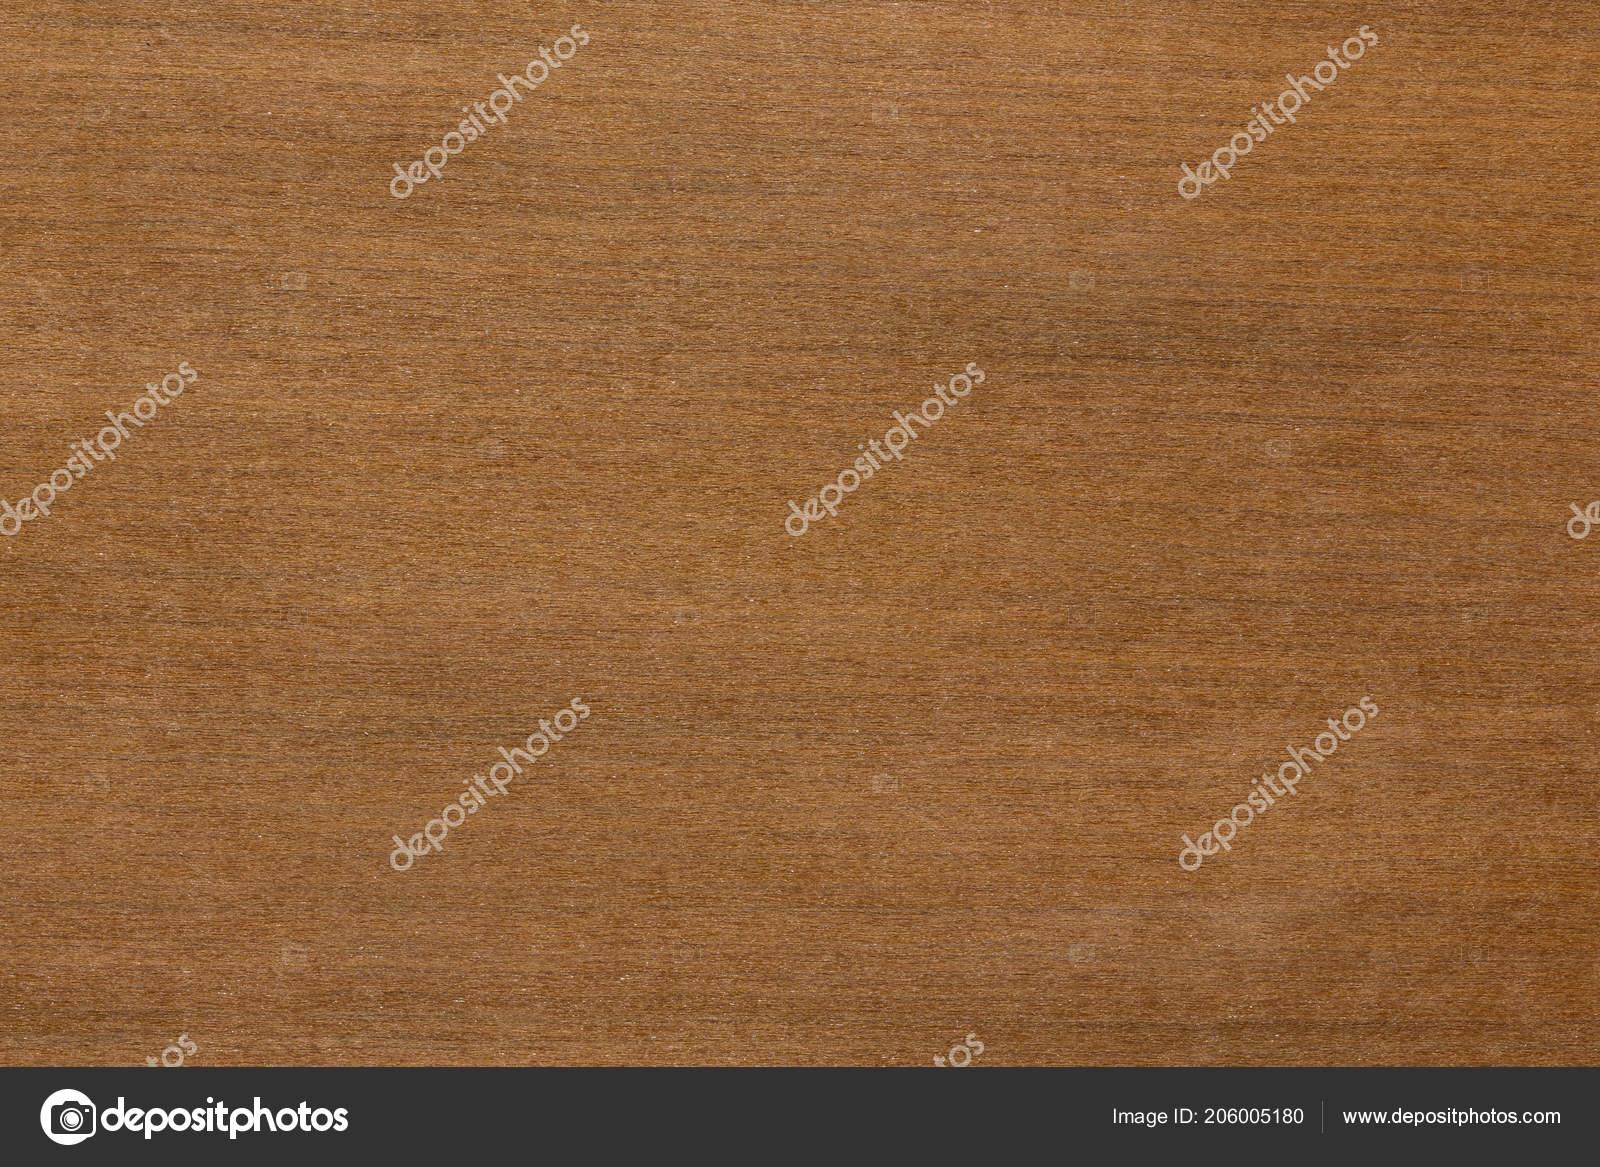 Brown Veneer Texture New Brown Teak Veneer Texture Your Design High Resolution Photo Stock Photo C Yamabikay 206005180